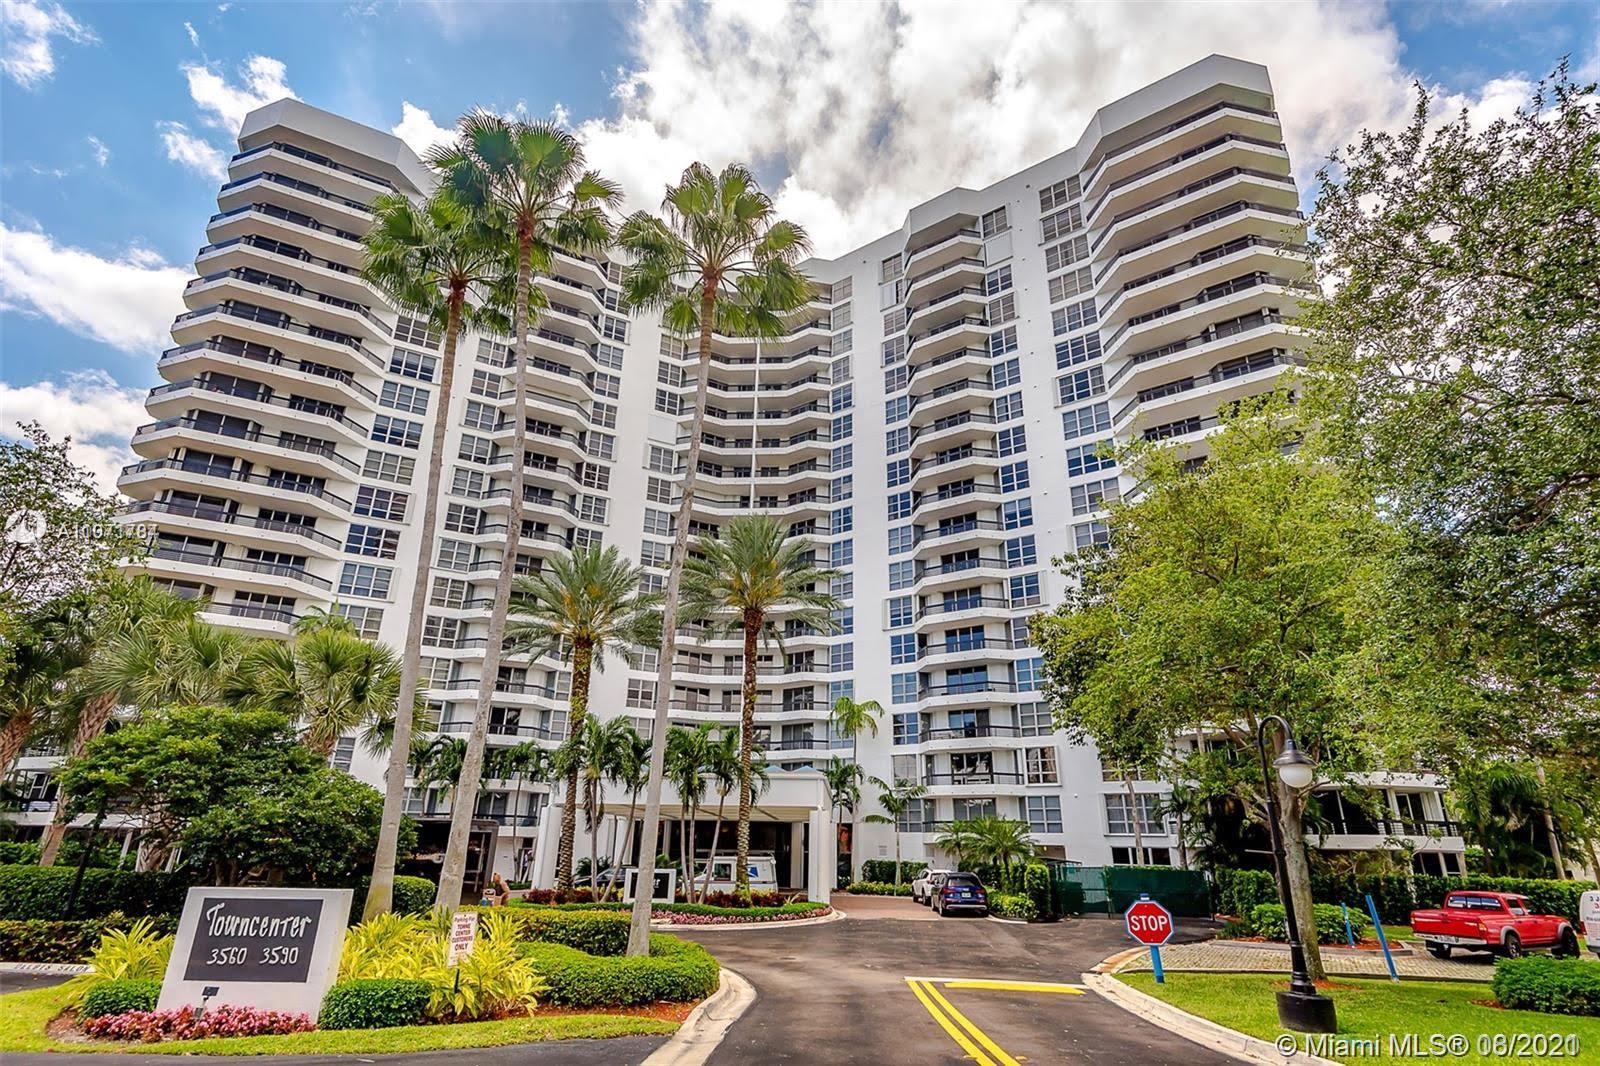 Mystic Pointe Tower 300 #507 - 3600 Mystic Pointe Dr #507, Aventura, FL 33180